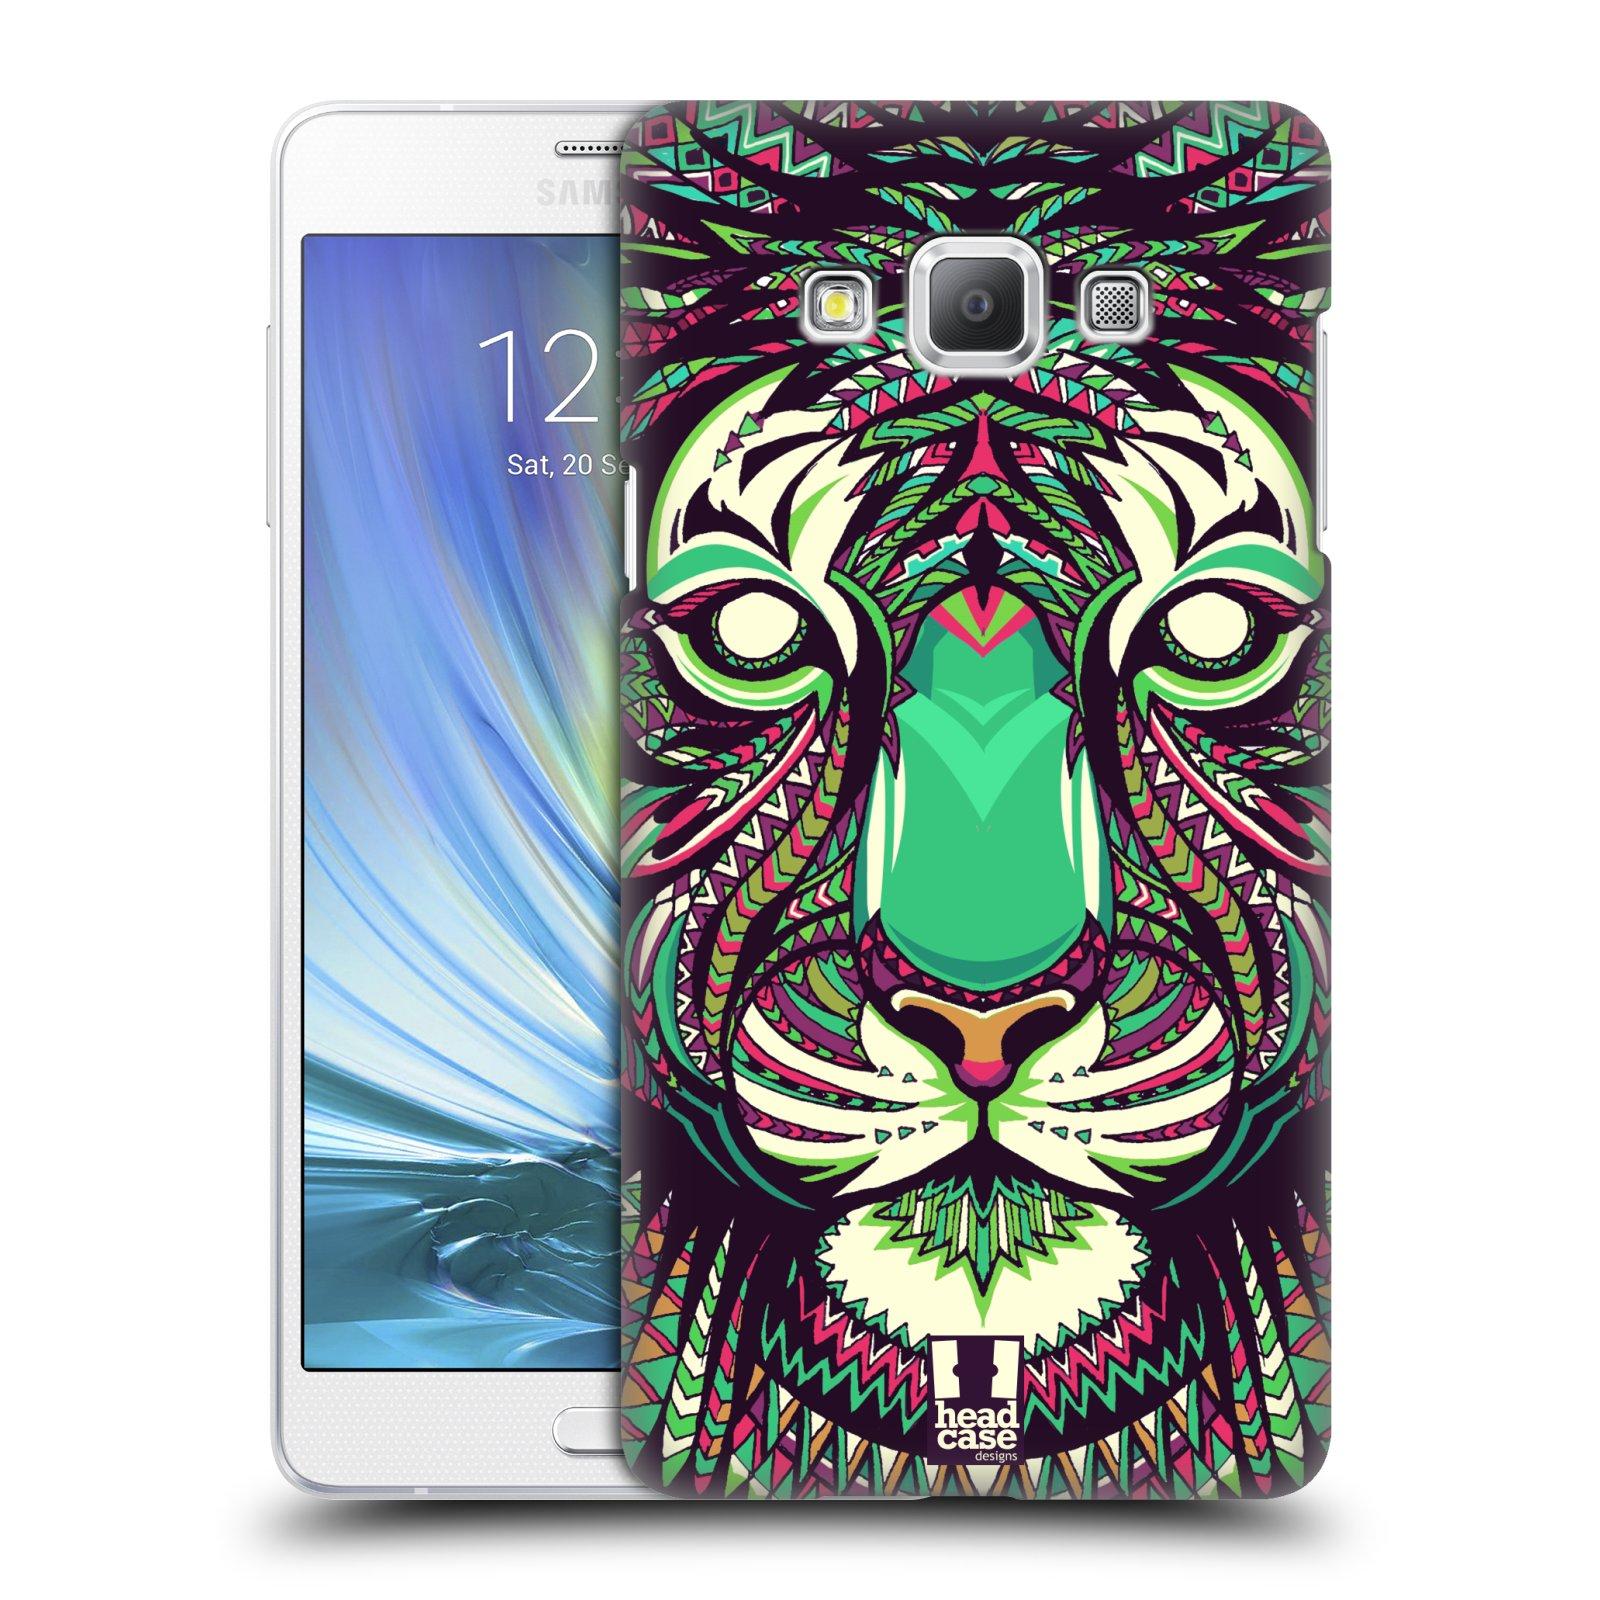 HEAD CASE plastový obal na mobil SAMSUNG GALAXY A7 vzor Aztécký motiv zvíře 2 tygr